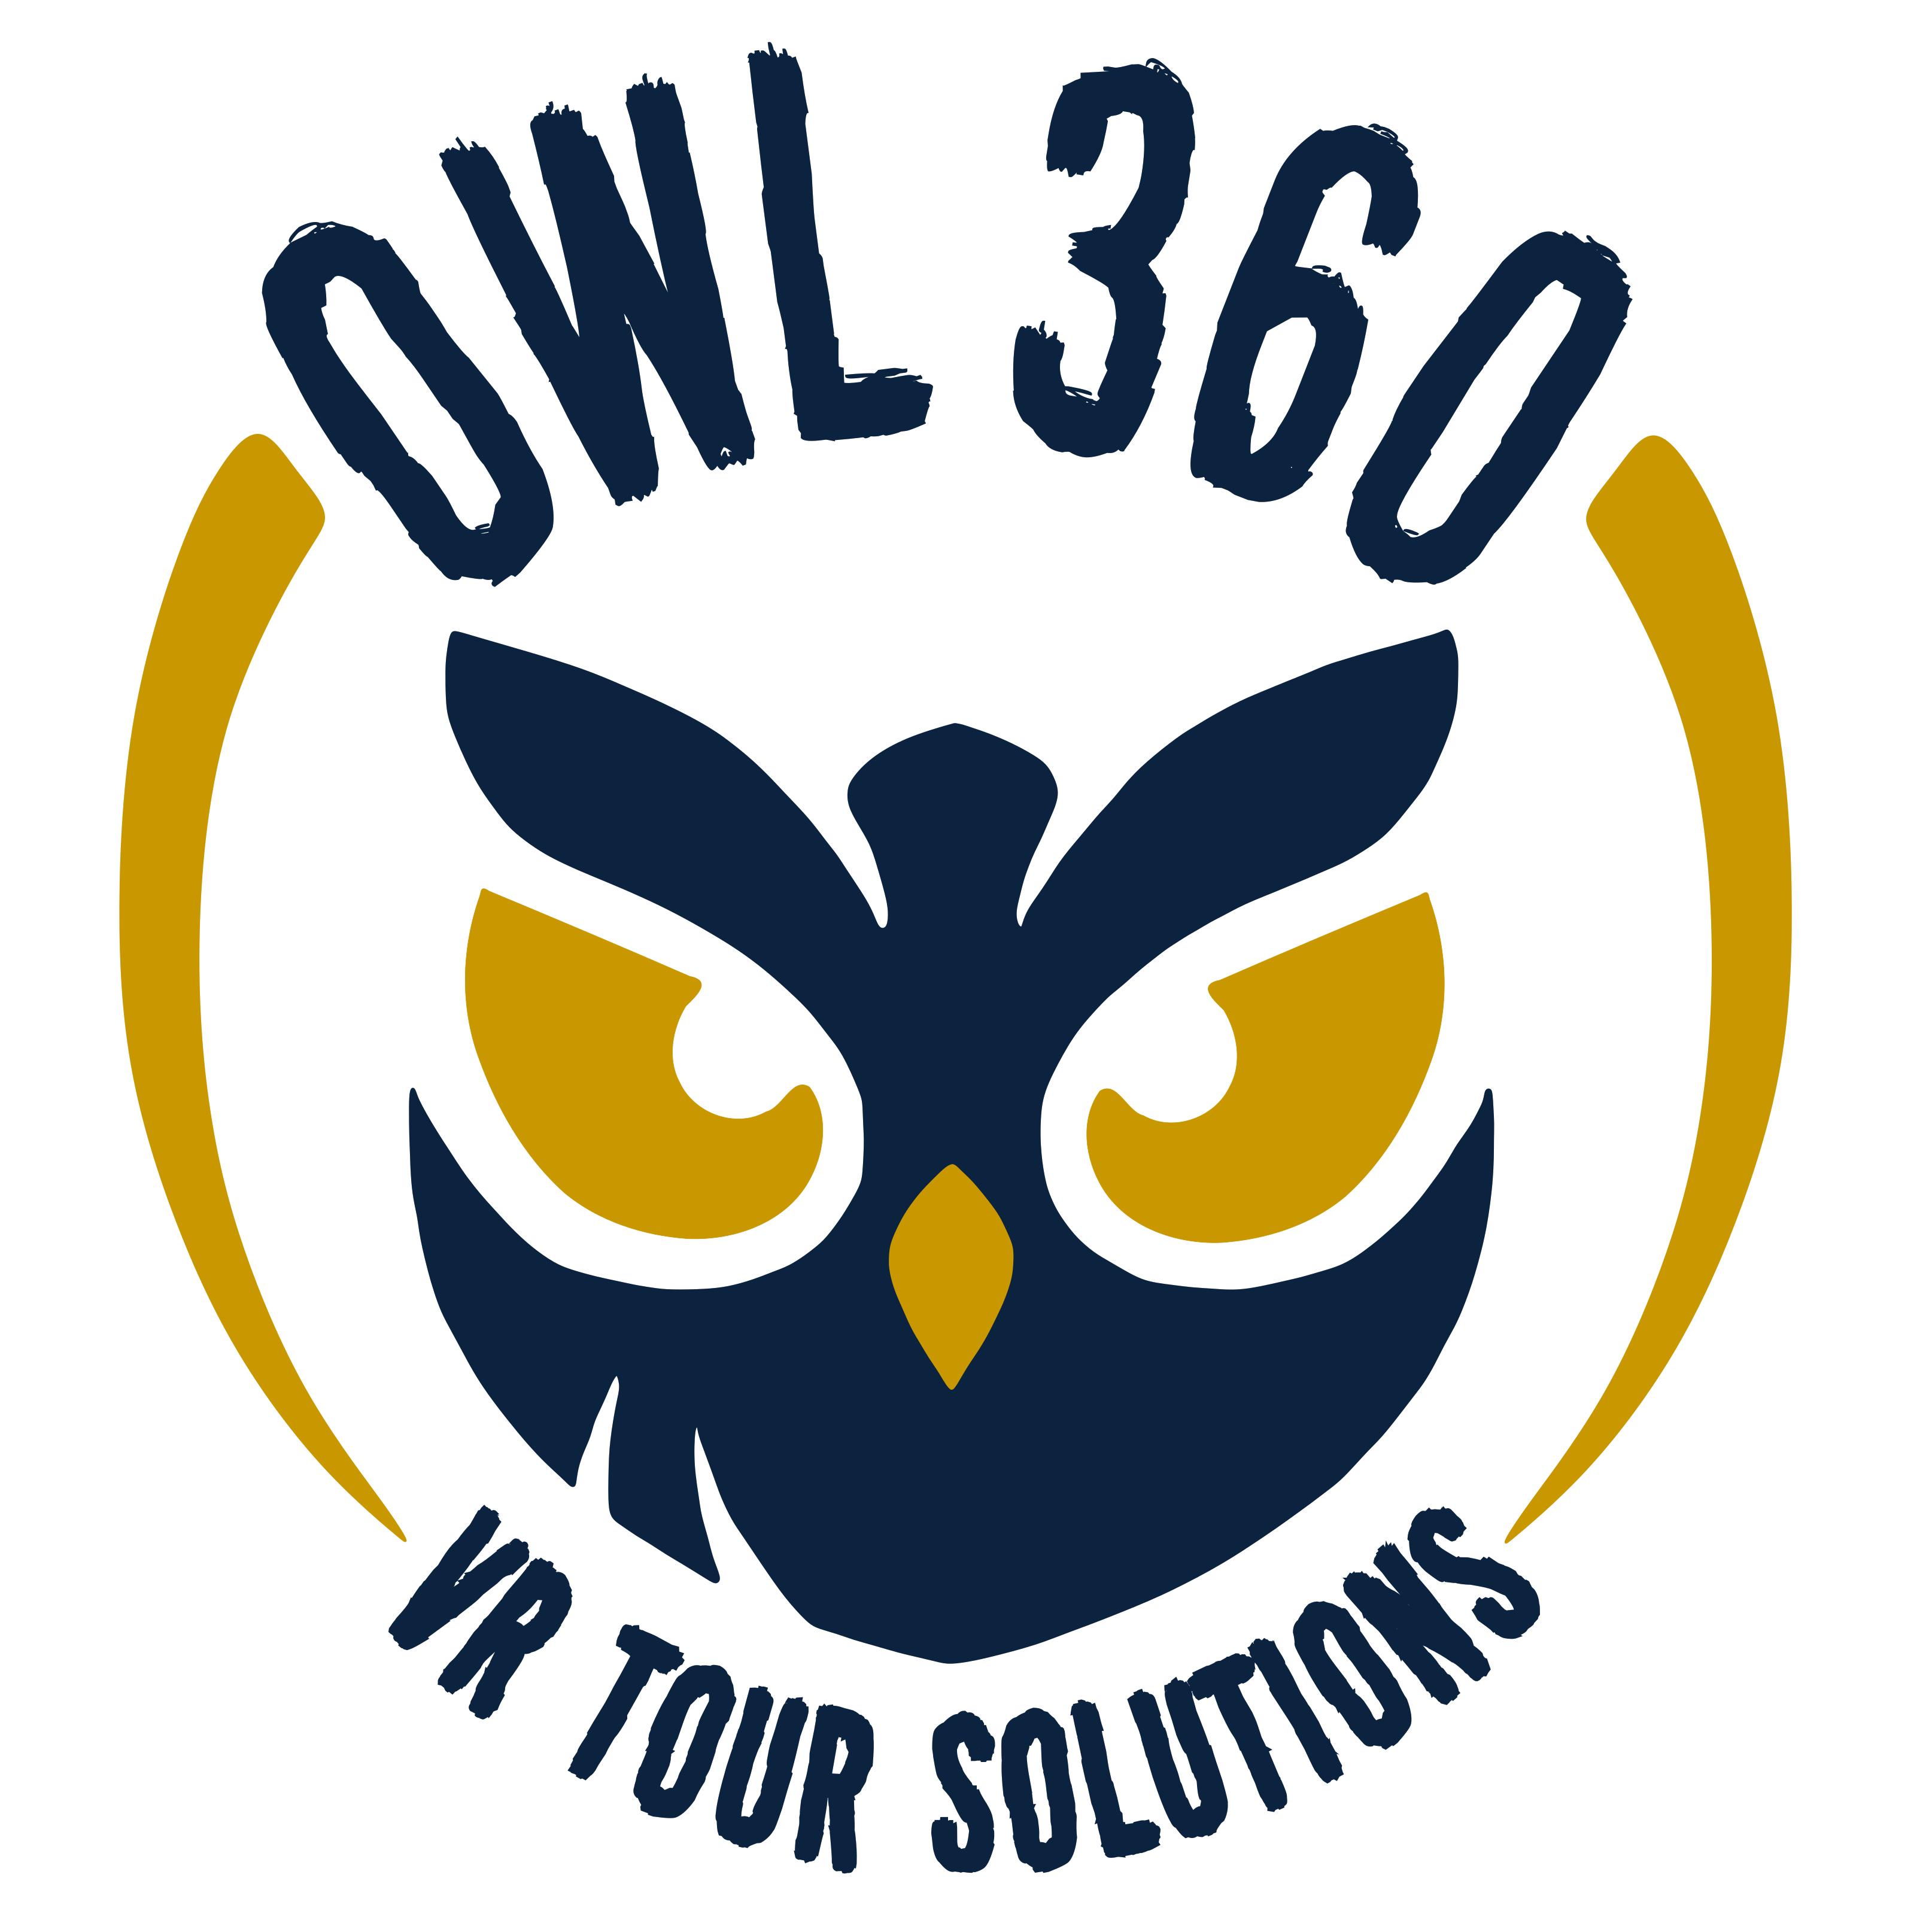 Owl 360 VR Tour Solutions